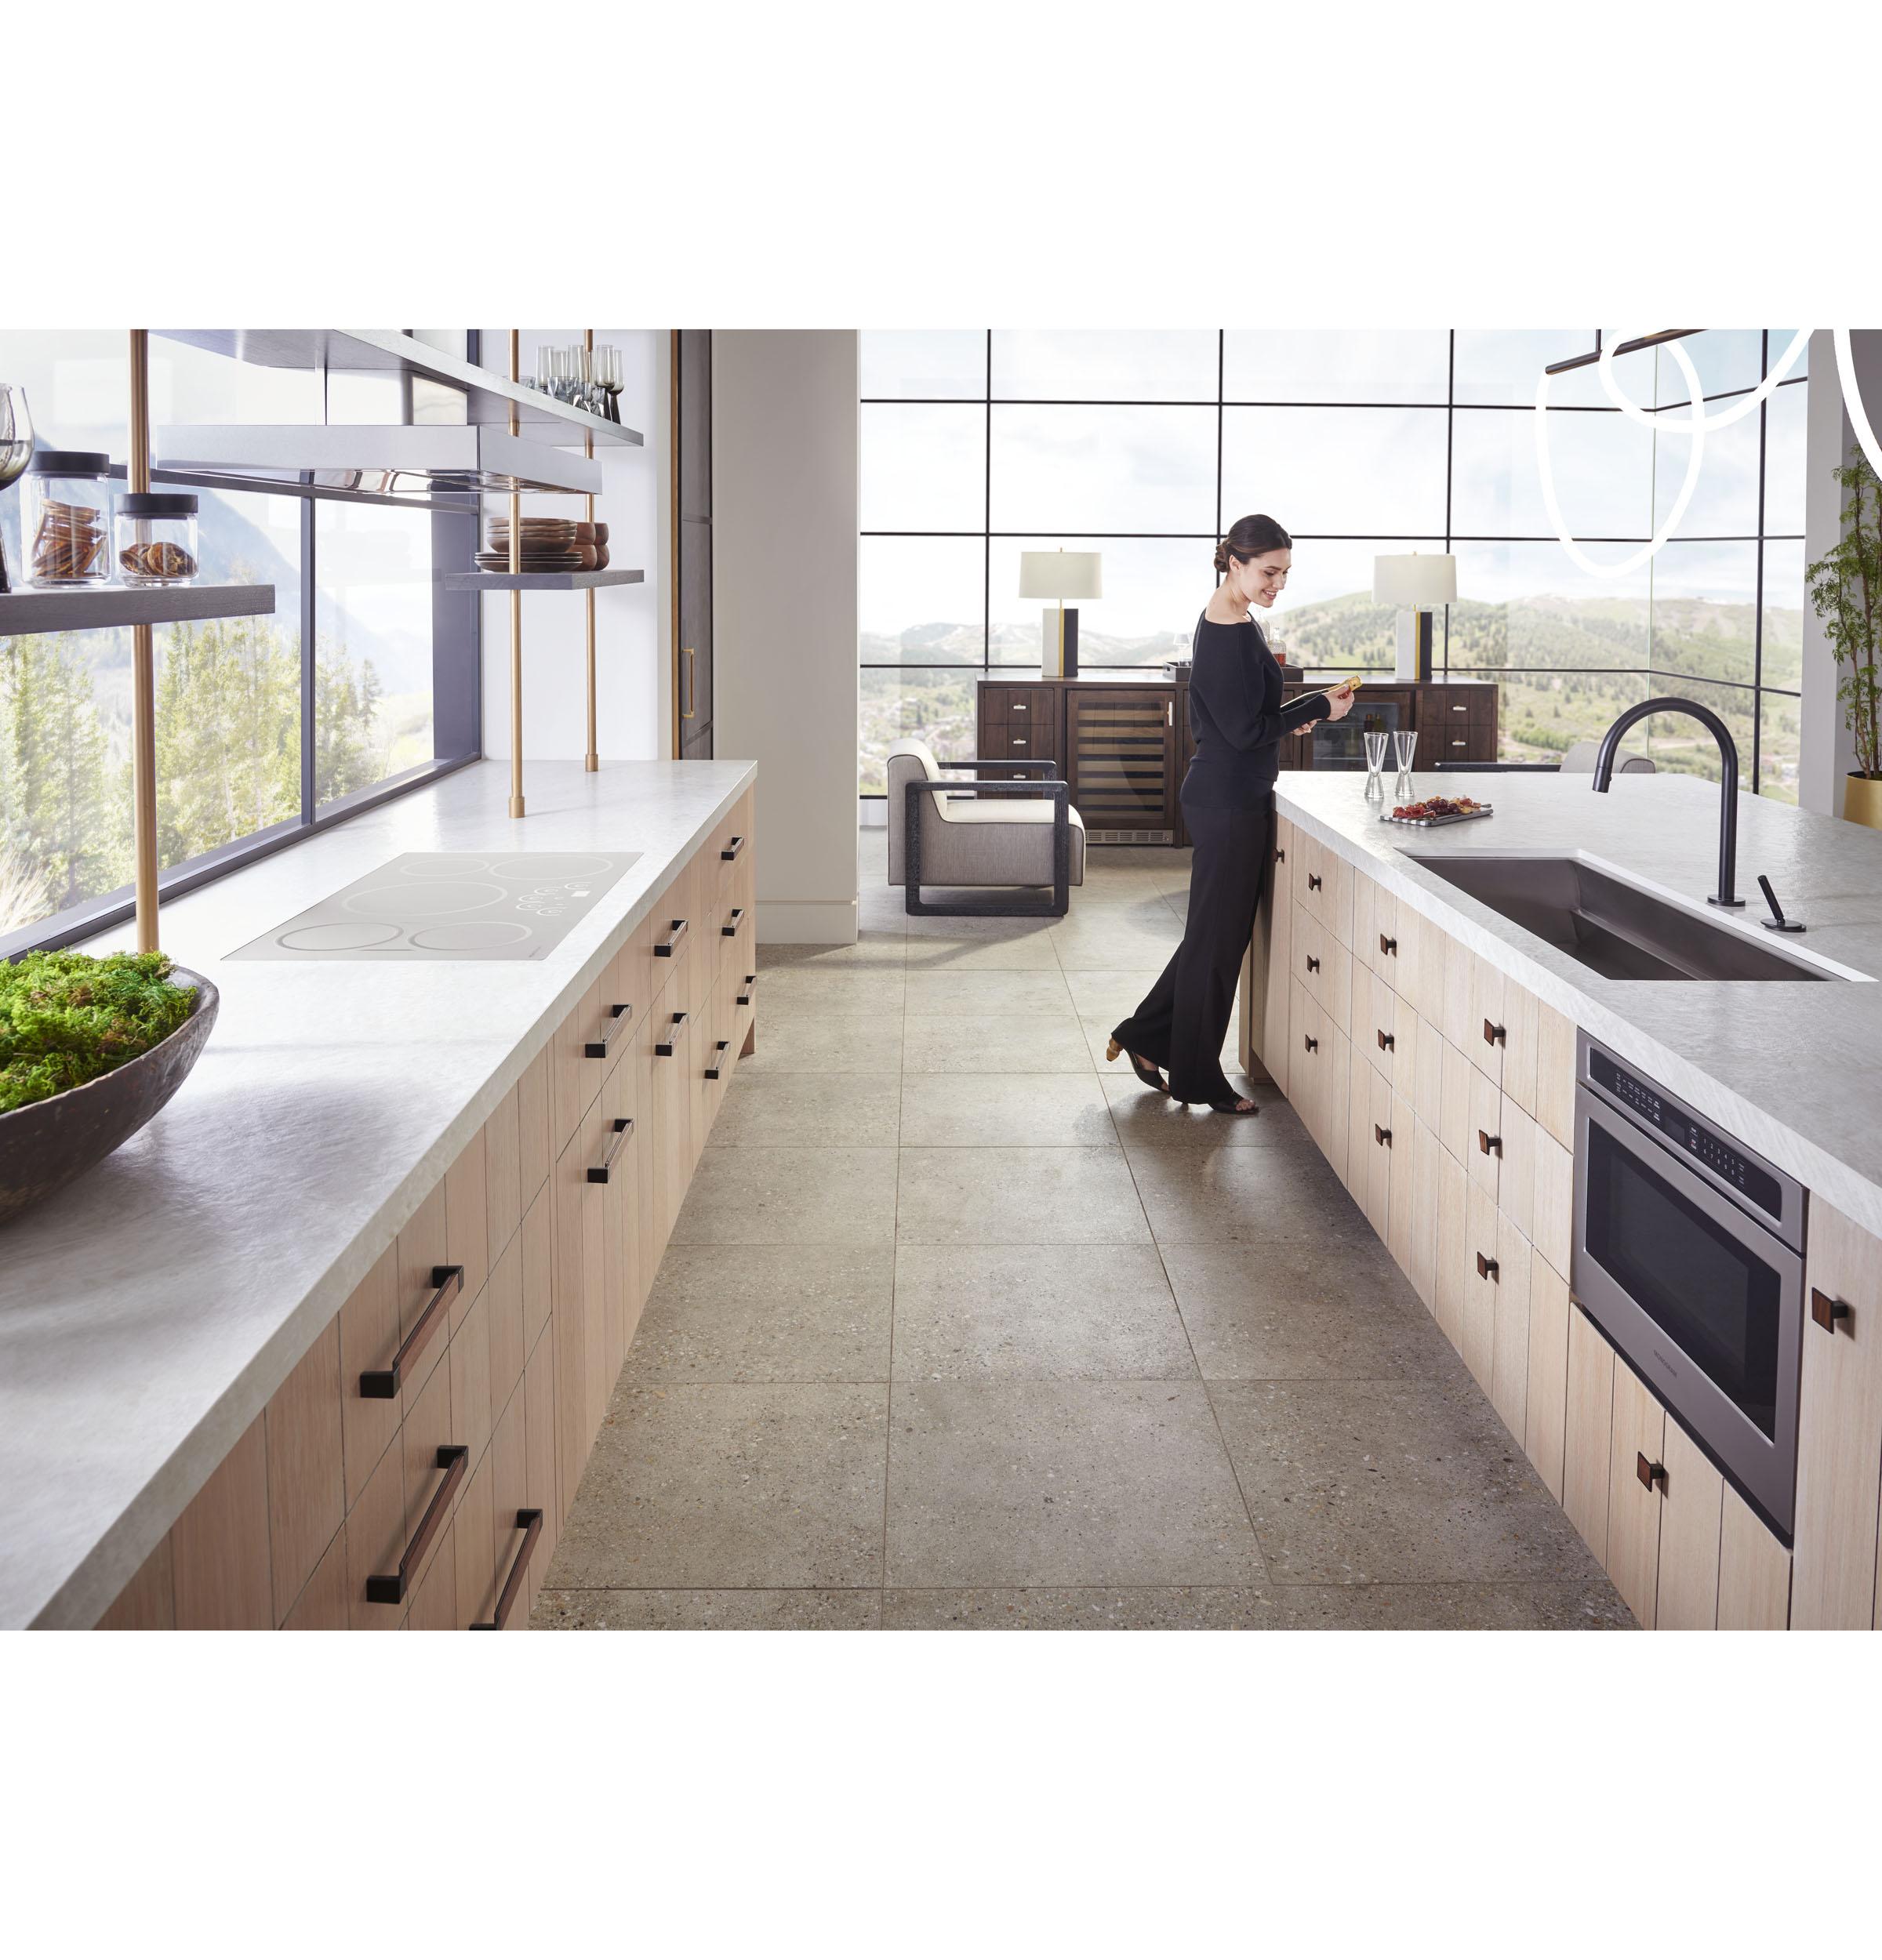 Model: ZDT985SINII | Monogram Monogram Smart Fully Integrated Dishwasher